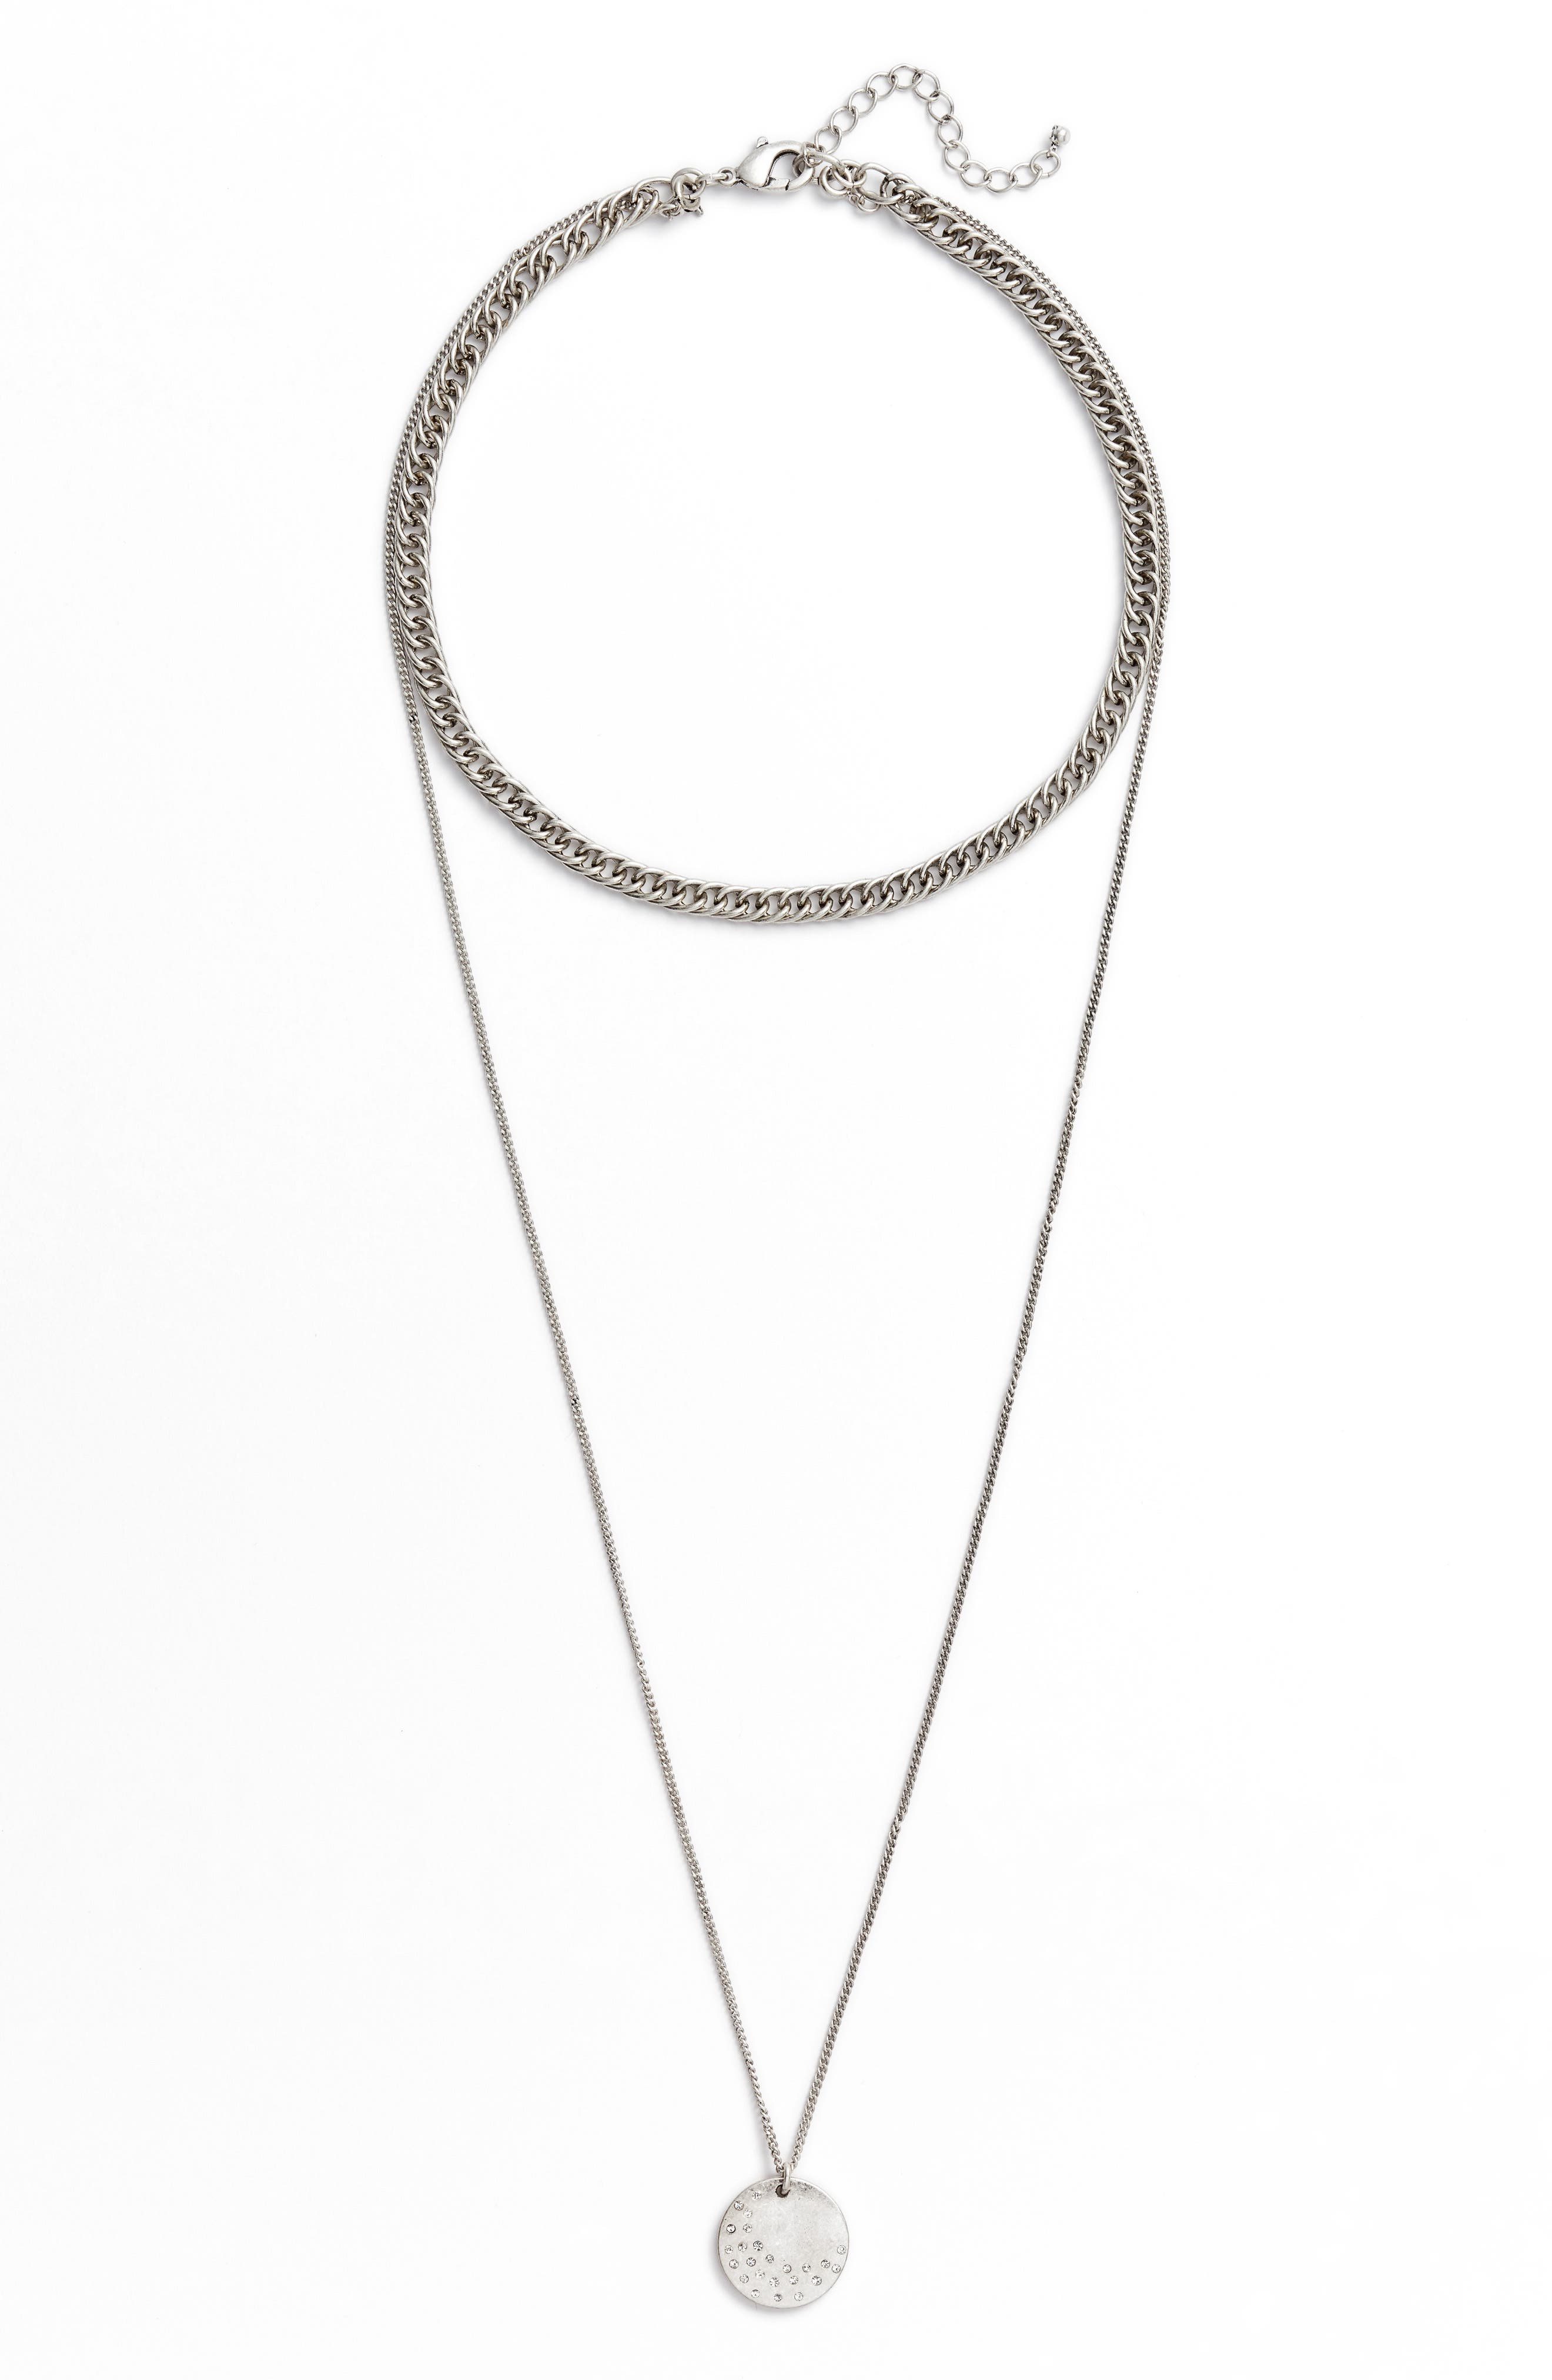 Alternate Image 1 Selected - Treasure & Bond x Something Navy Multistrand Necklace